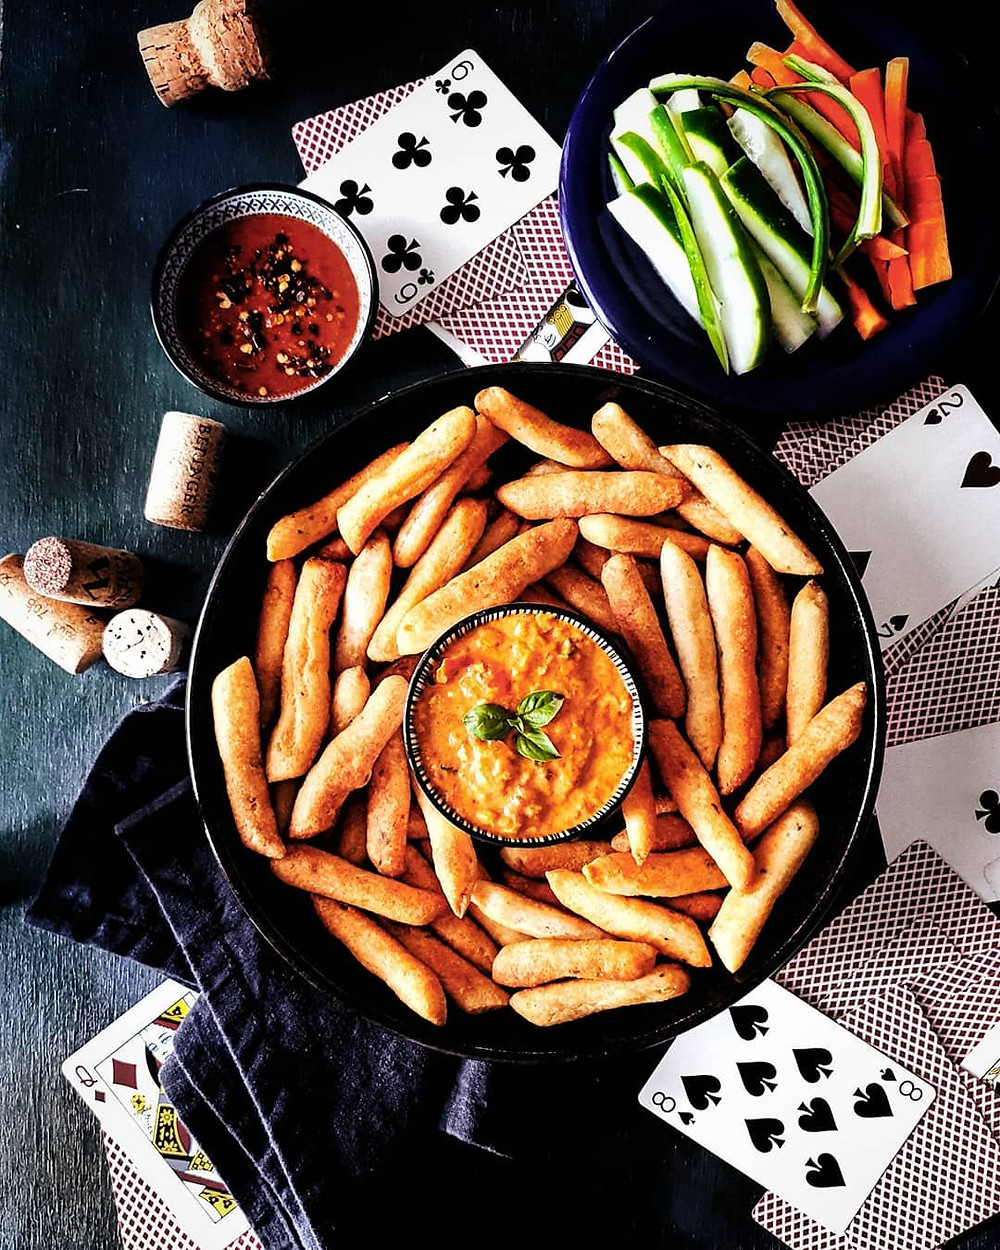 Gluten Free and Vegan Garlic Breadsticks